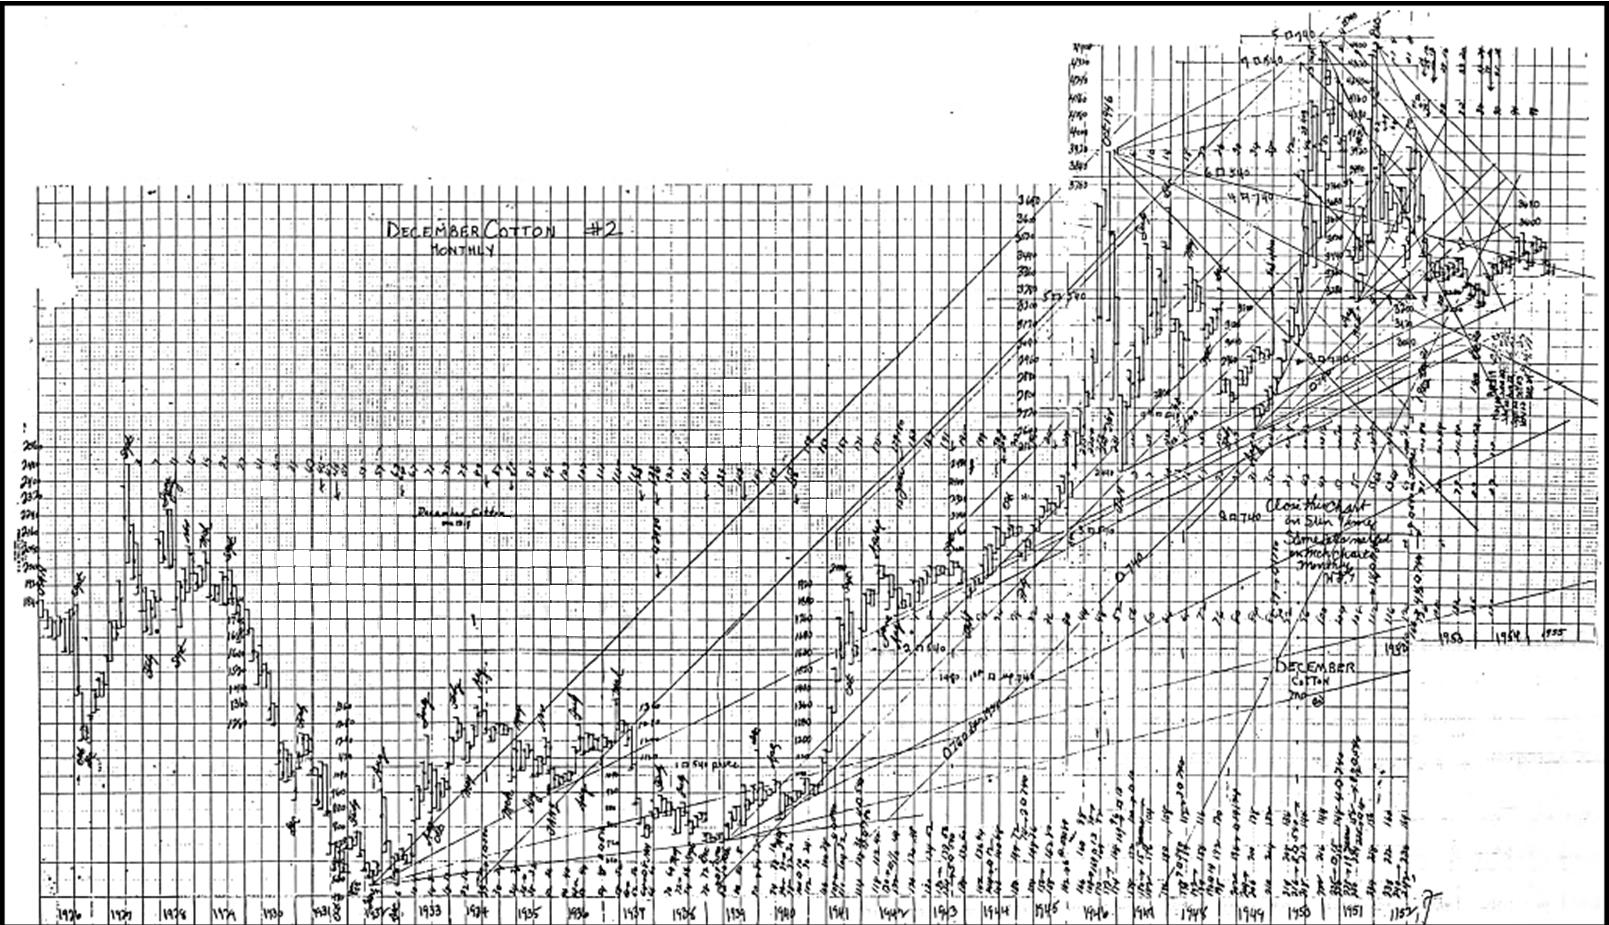 WD Gann December Cotton Monthly Chart